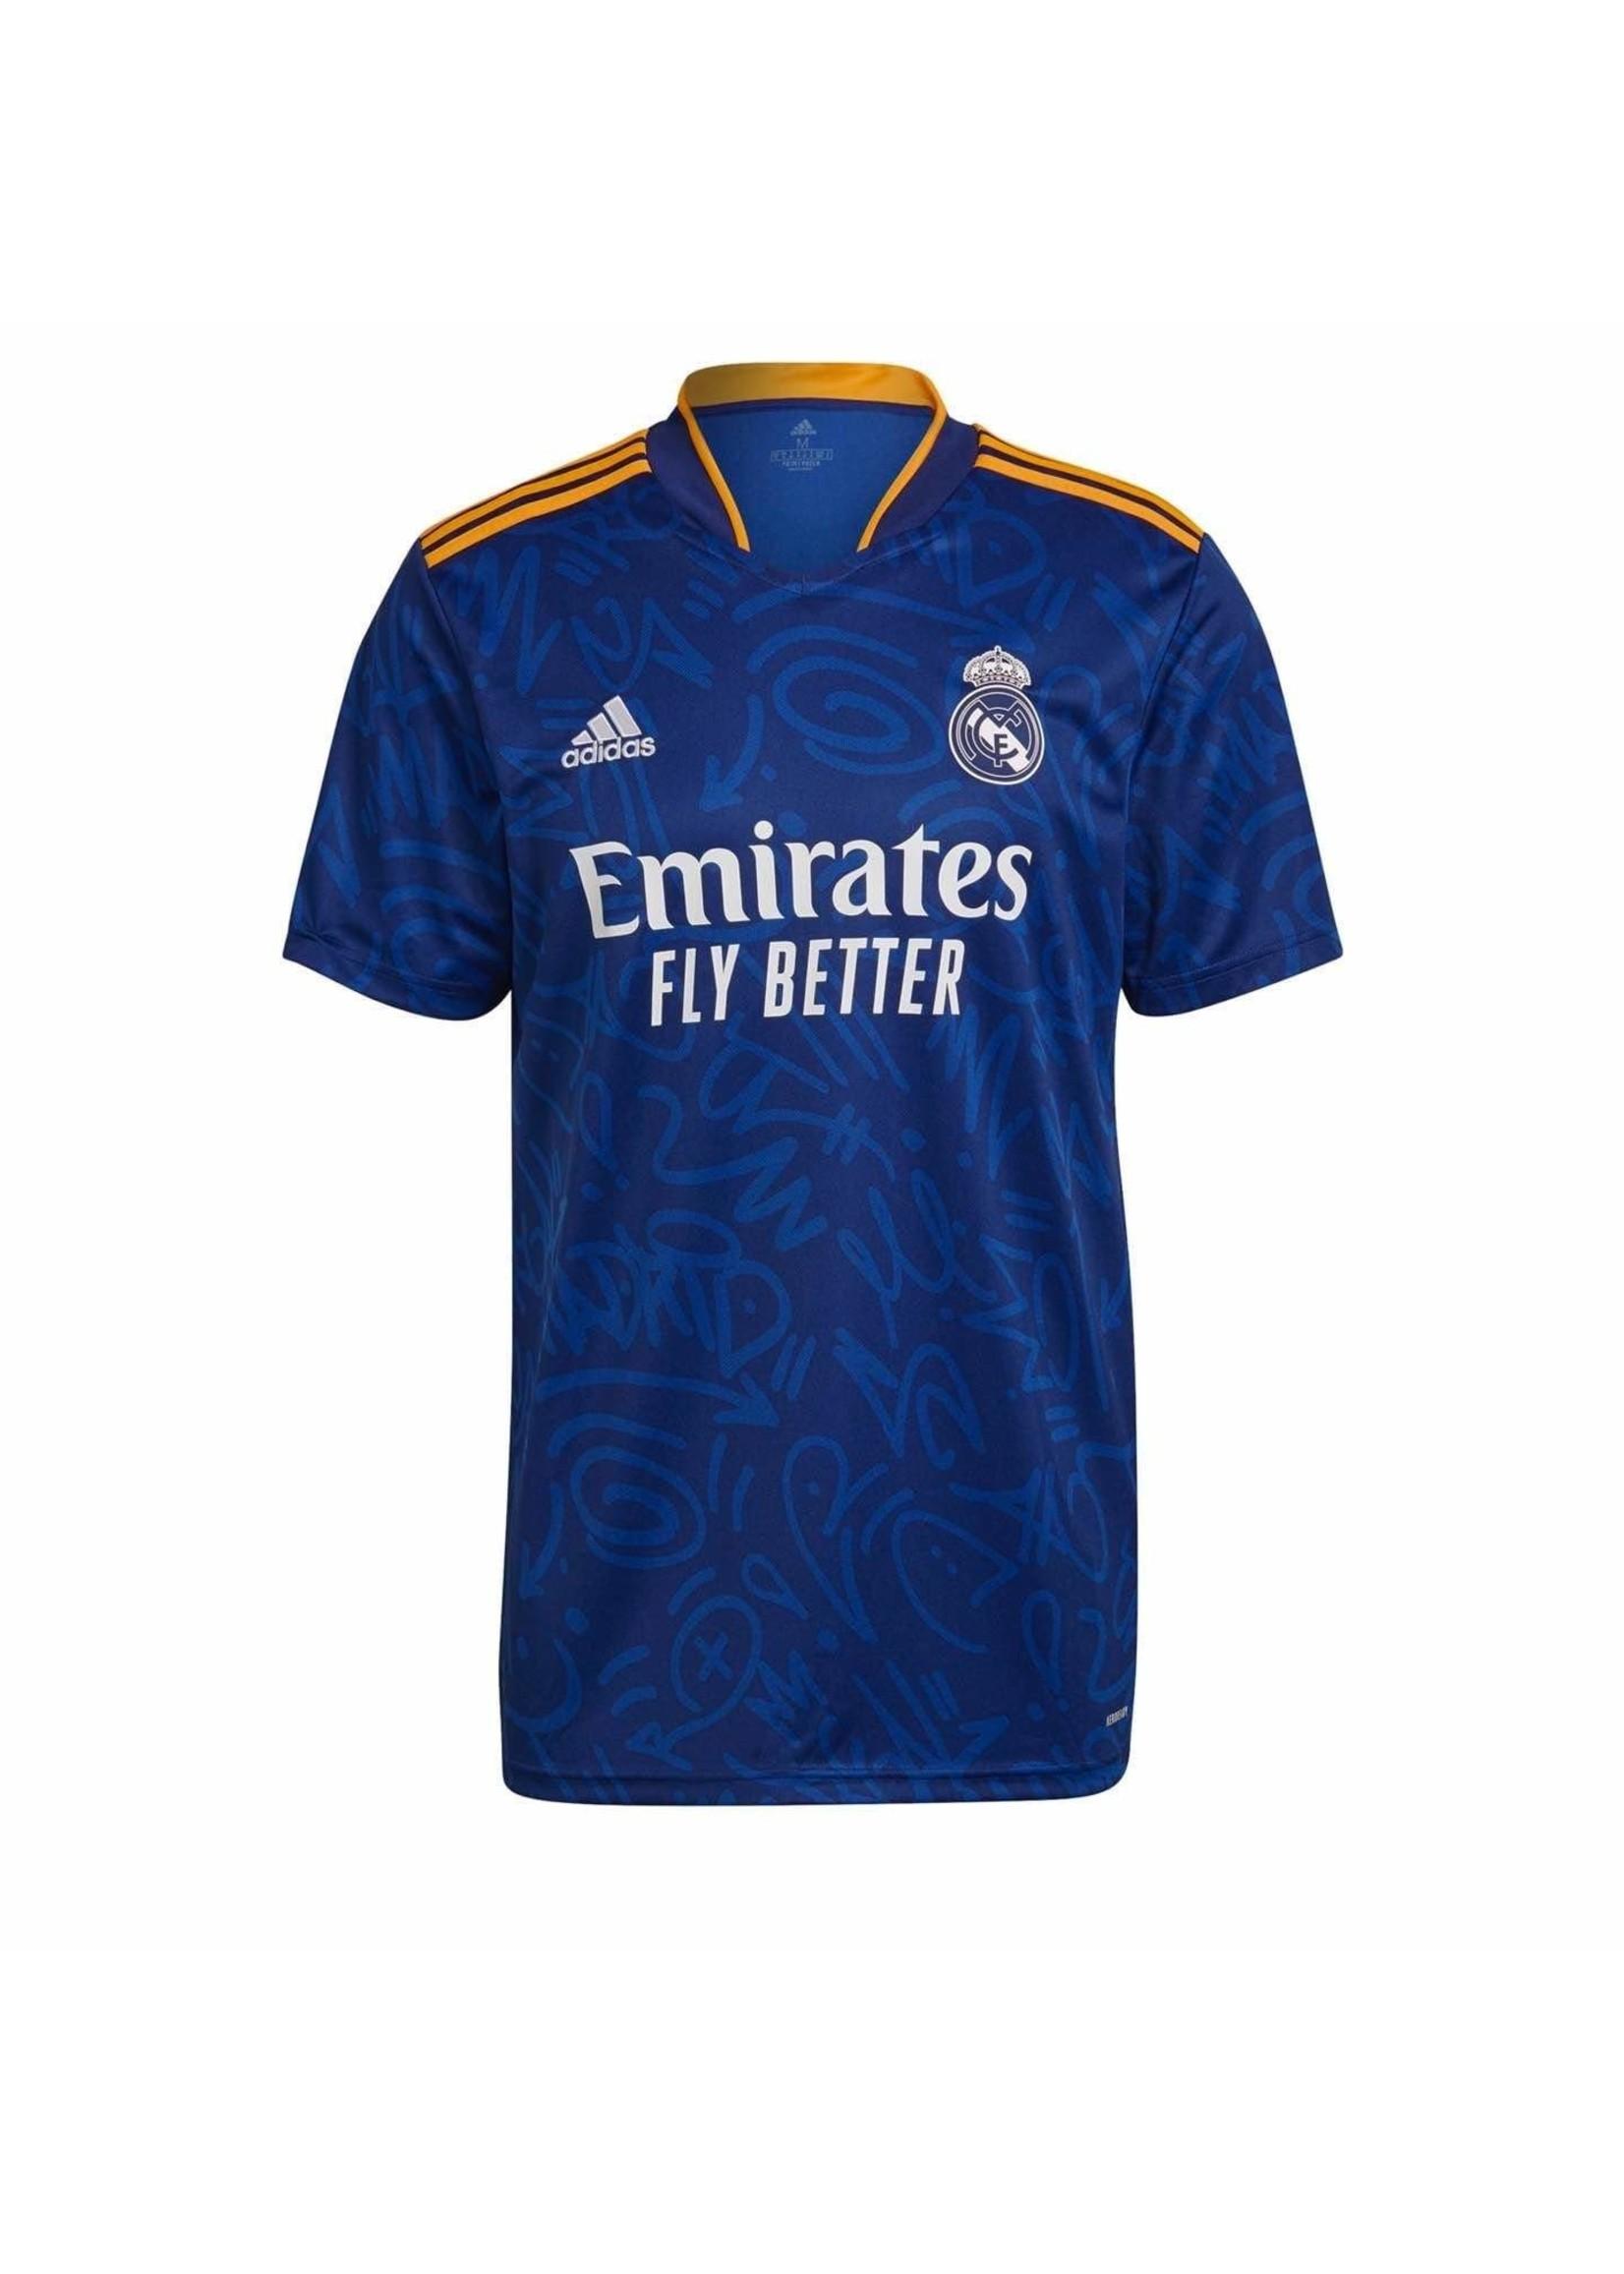 Adidas REAL MADRID AWAY JERSEY 2021/22